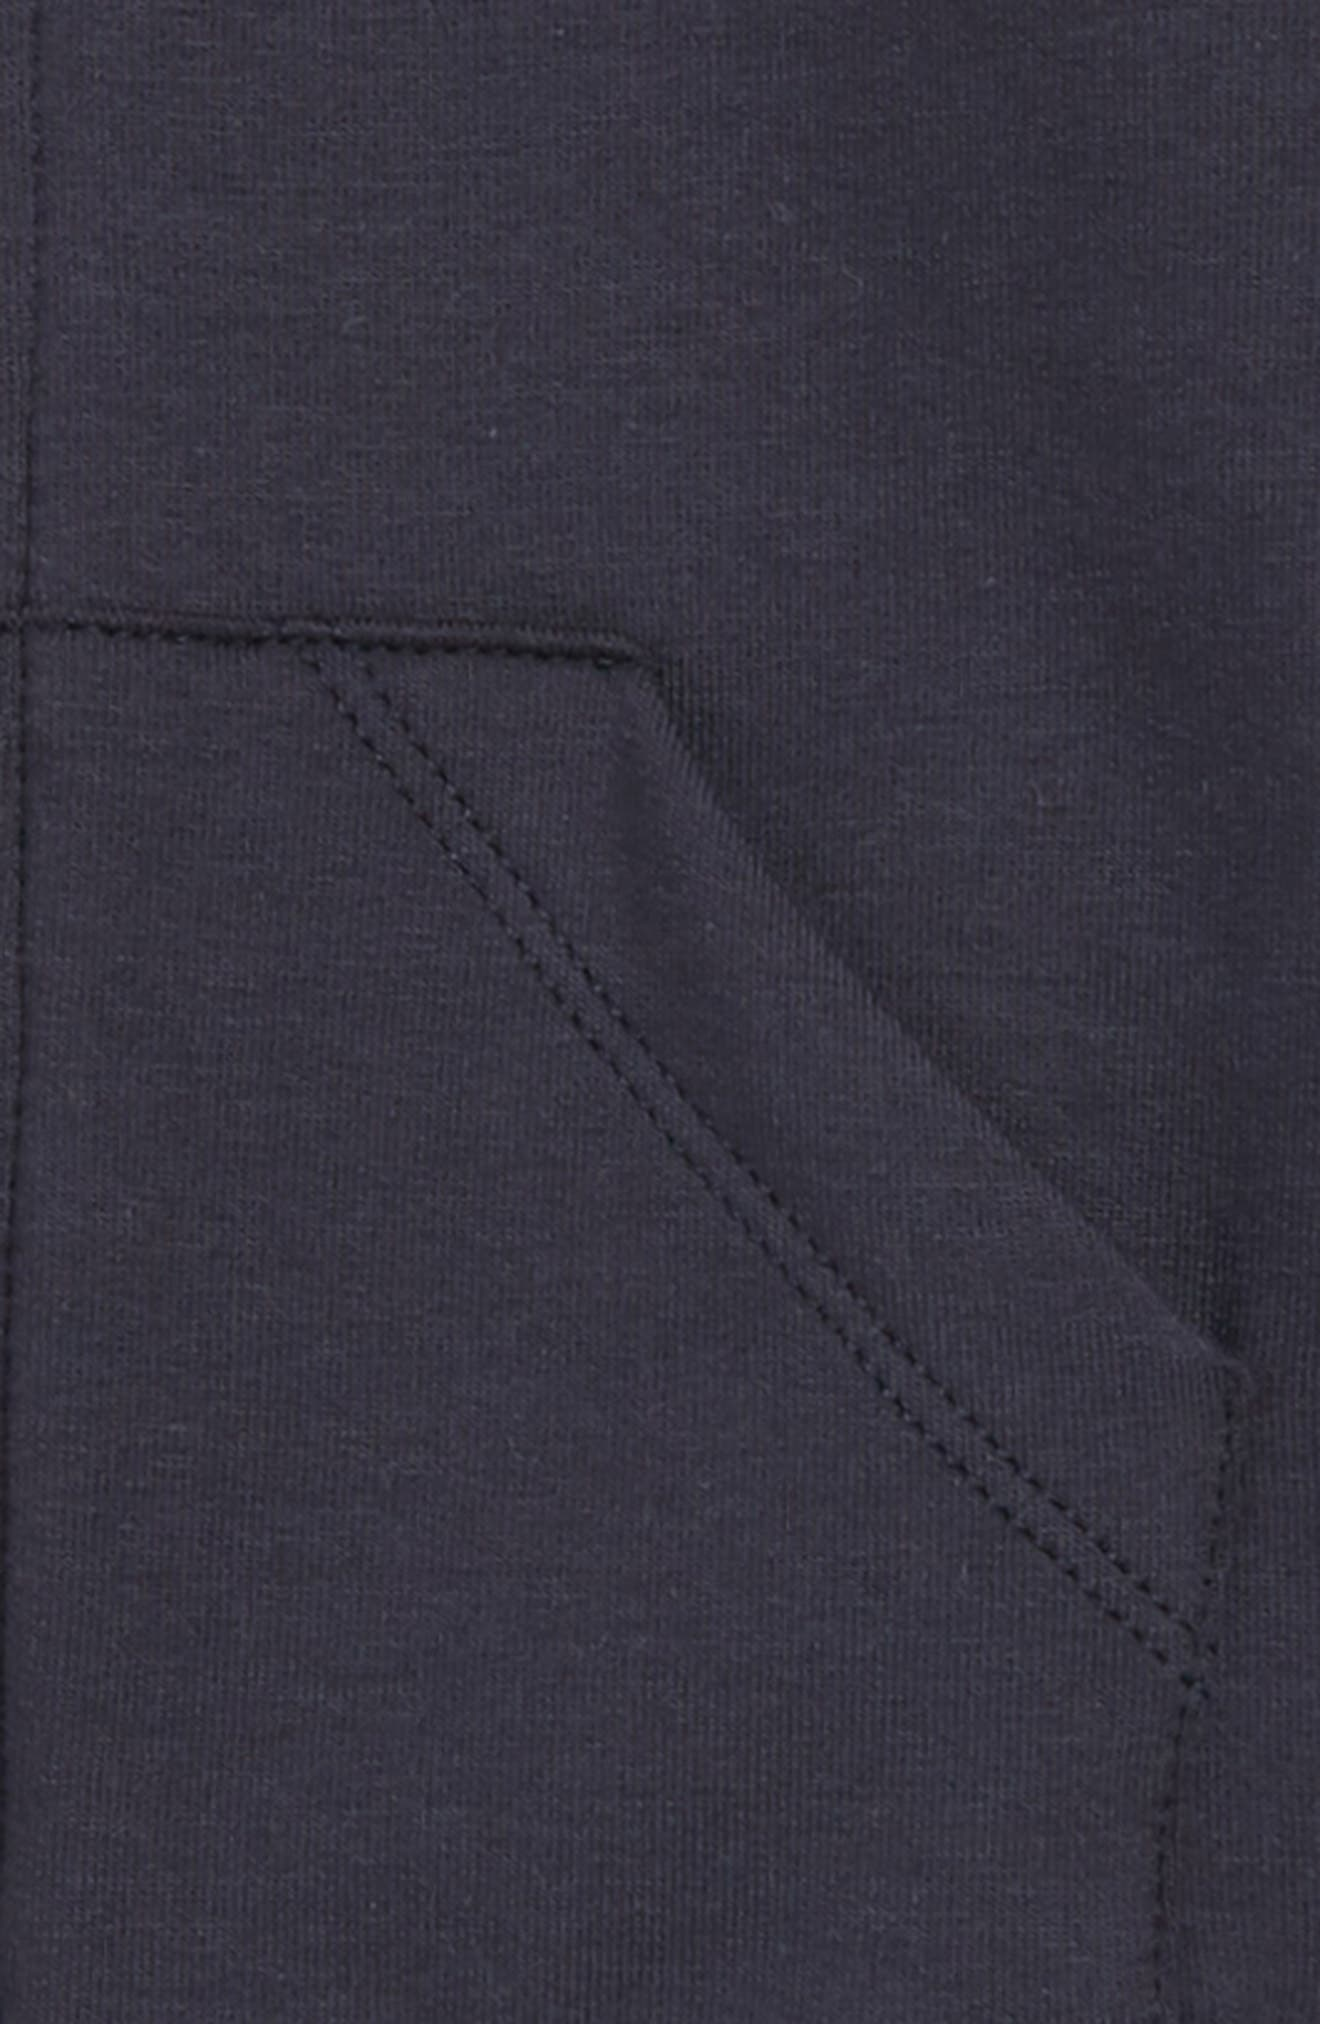 Zip-Up Jacket & Sweatpants Set,                             Alternate thumbnail 2, color,                             419